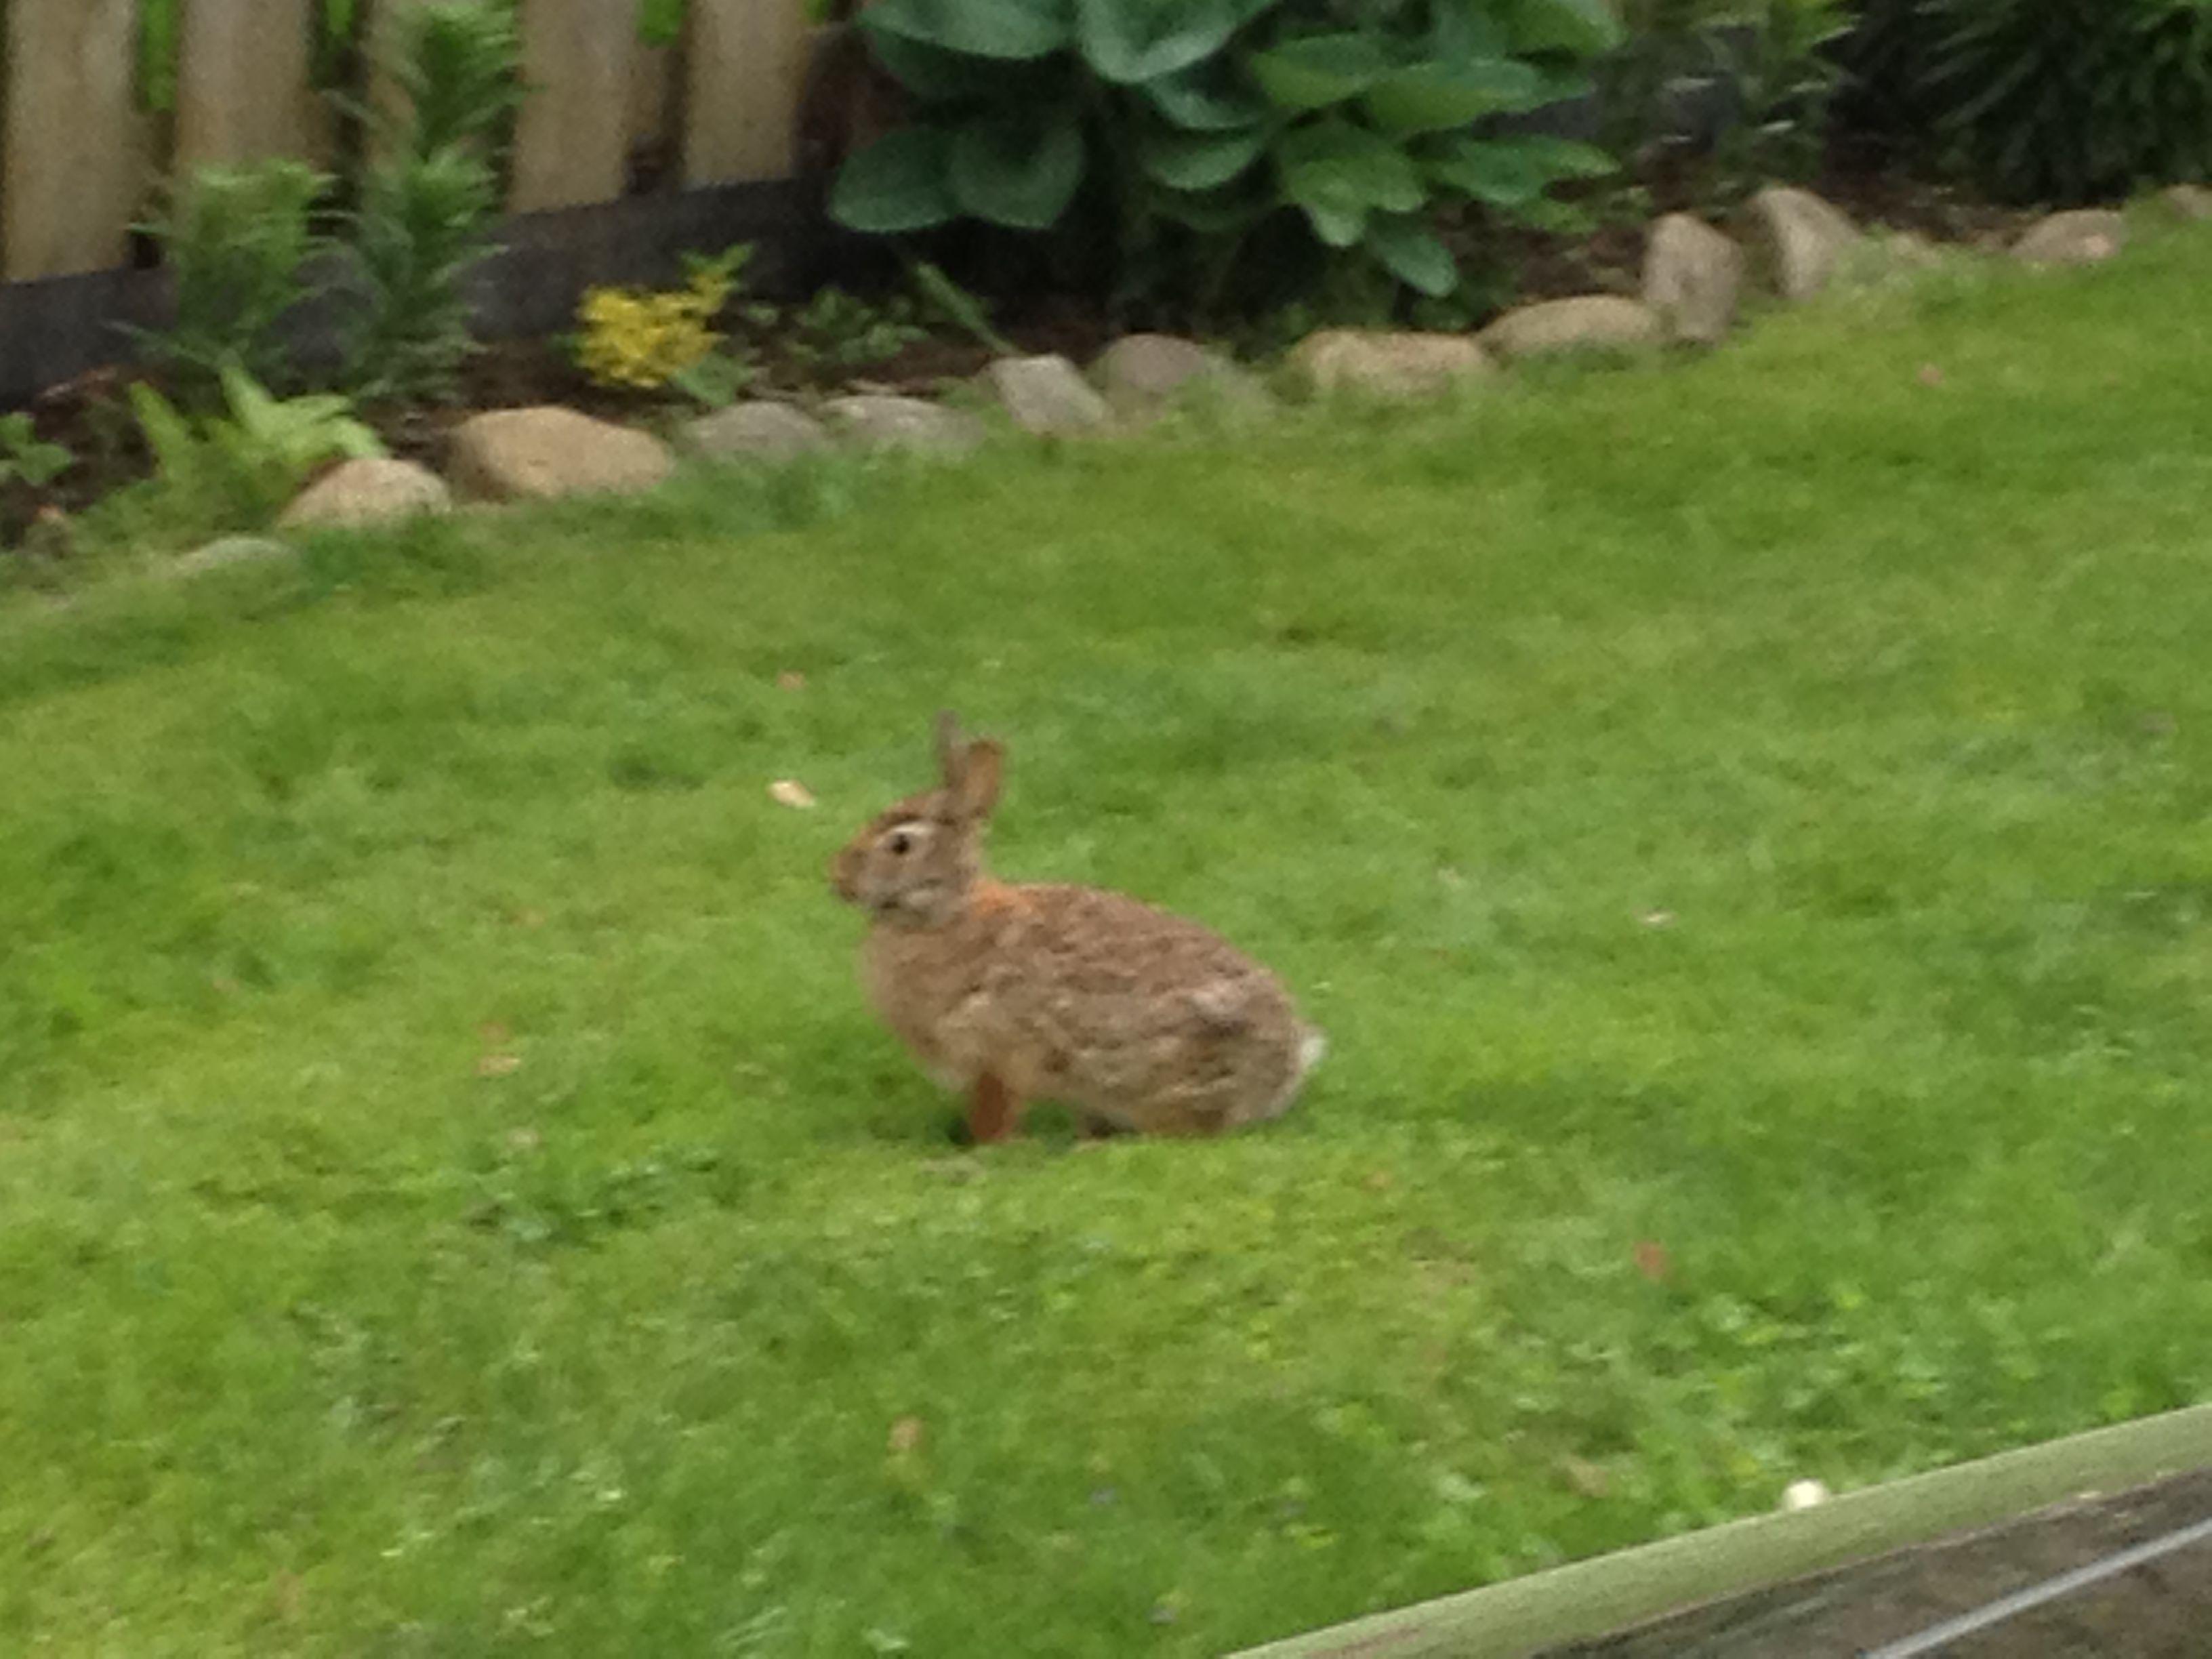 Rabbit in the yard | Photography | Pinterest